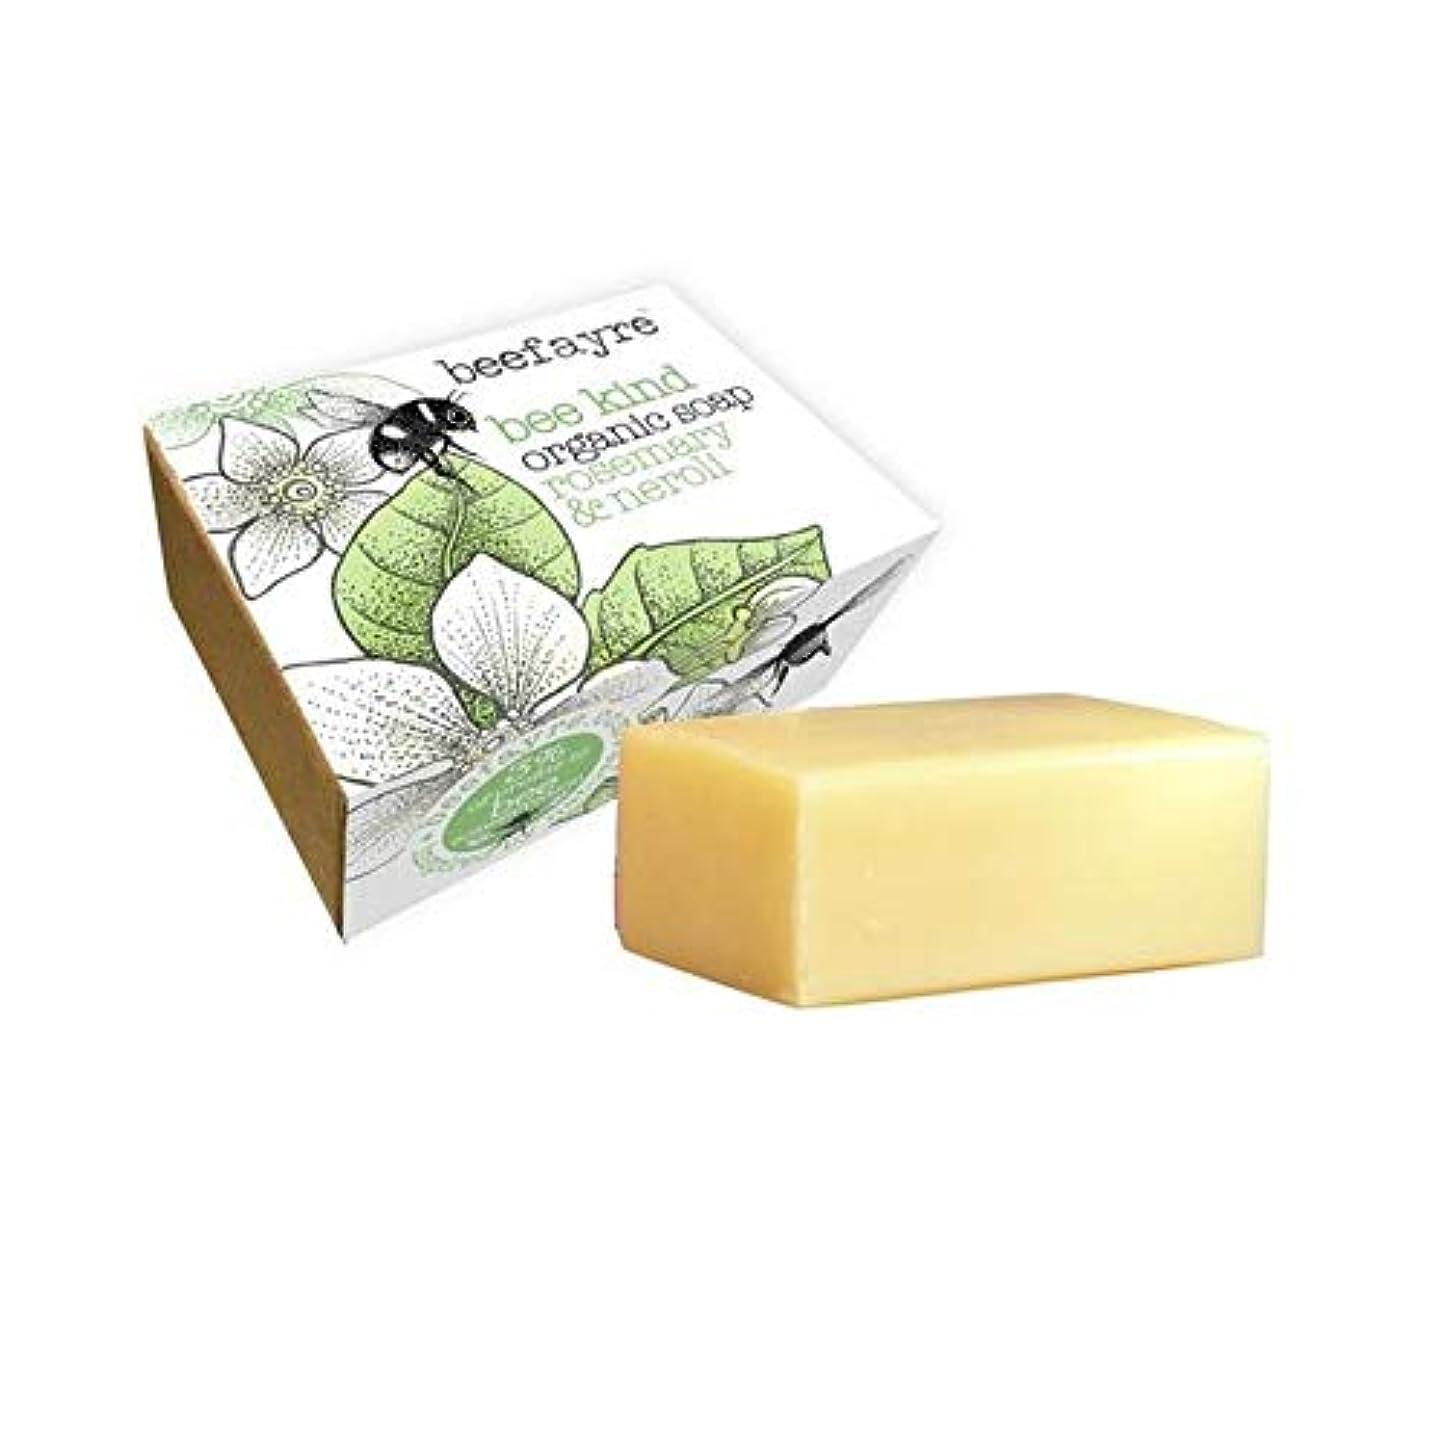 [Beefayre] 有機ローズマリー&ネロリソープバー100グラムBeefayre - Beefayre Organic Rosemary & Neroli Soap Bar 100g [並行輸入品]